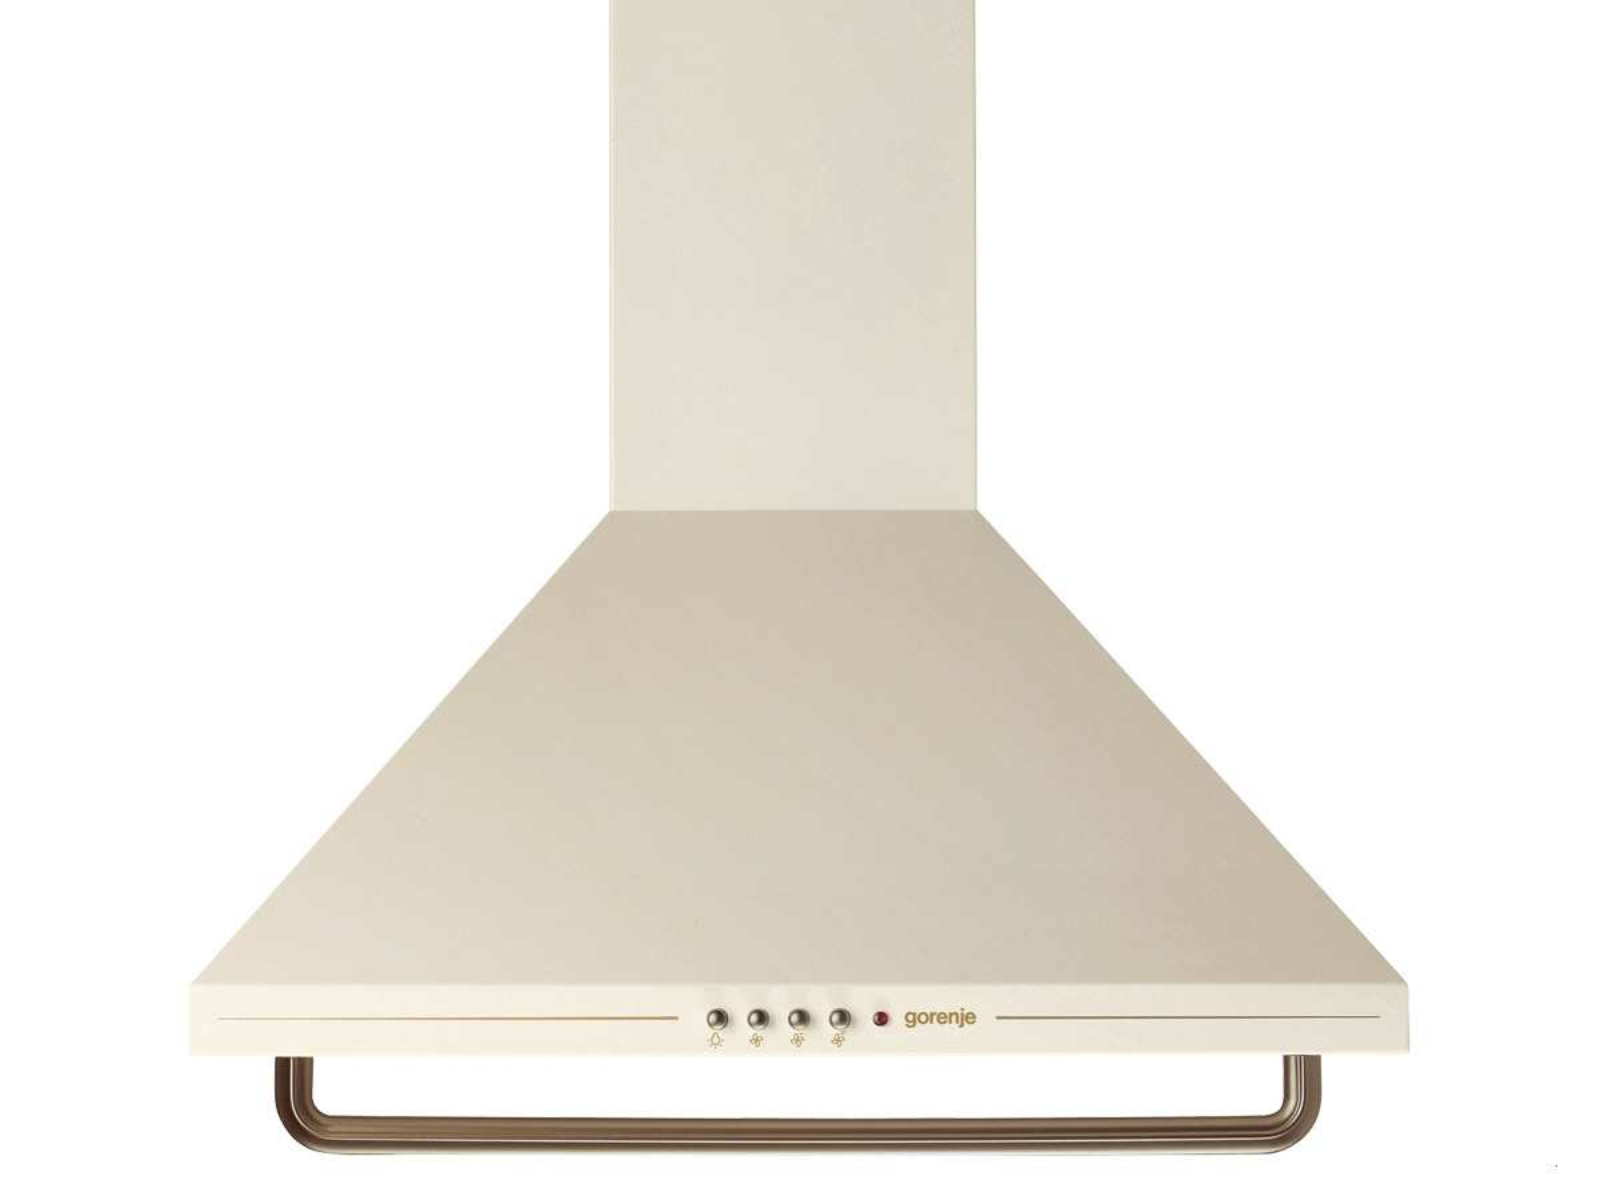 gorenje dk 63 cli classico wand dunstabzugshaube elfenbein ebay. Black Bedroom Furniture Sets. Home Design Ideas